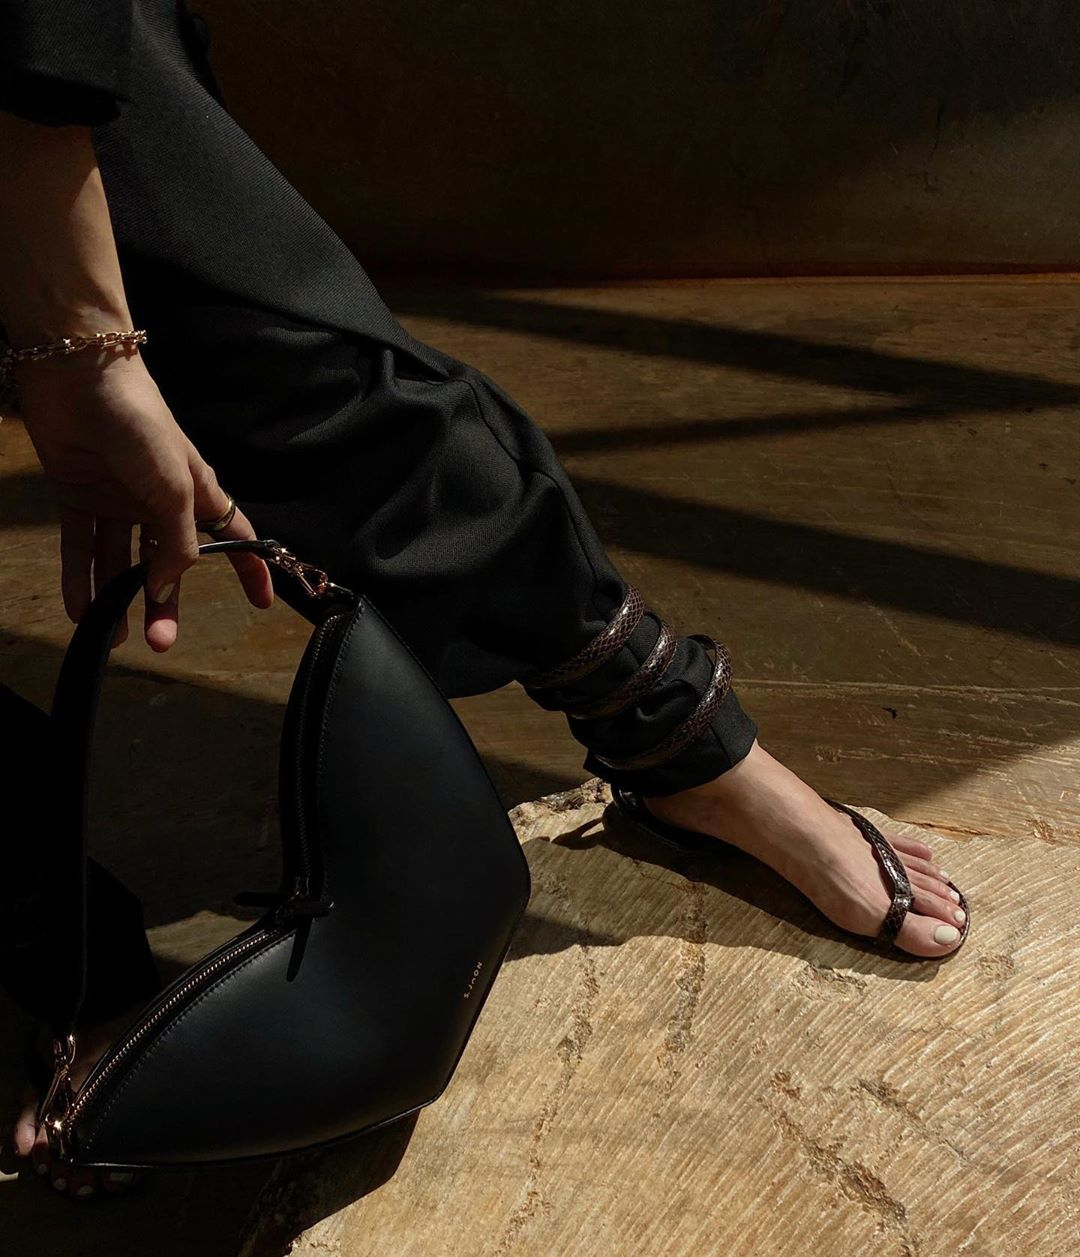 Shop-Springs-Biggest-Footwear-Trend-Ankle-Strap-Sandals-Via-Instagram-Savina-Chai-Le-Fashion-Blog